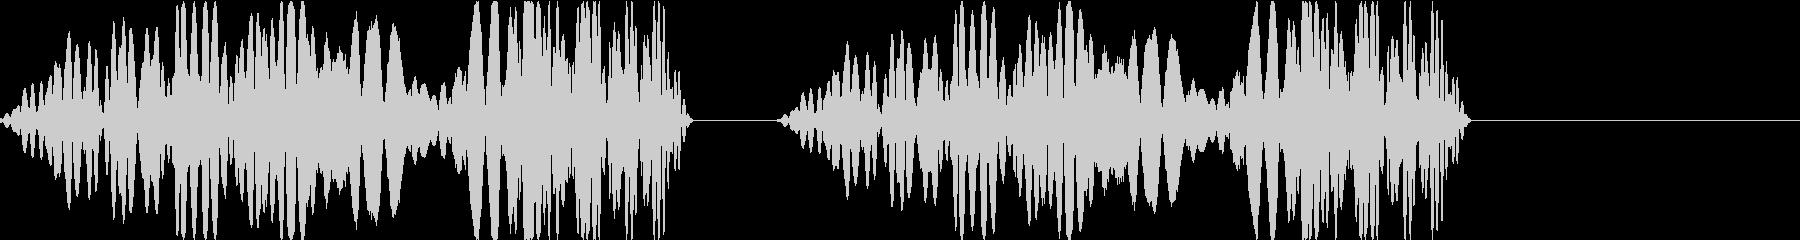 DJプレイ スクラッチ・ノイズ 255の未再生の波形